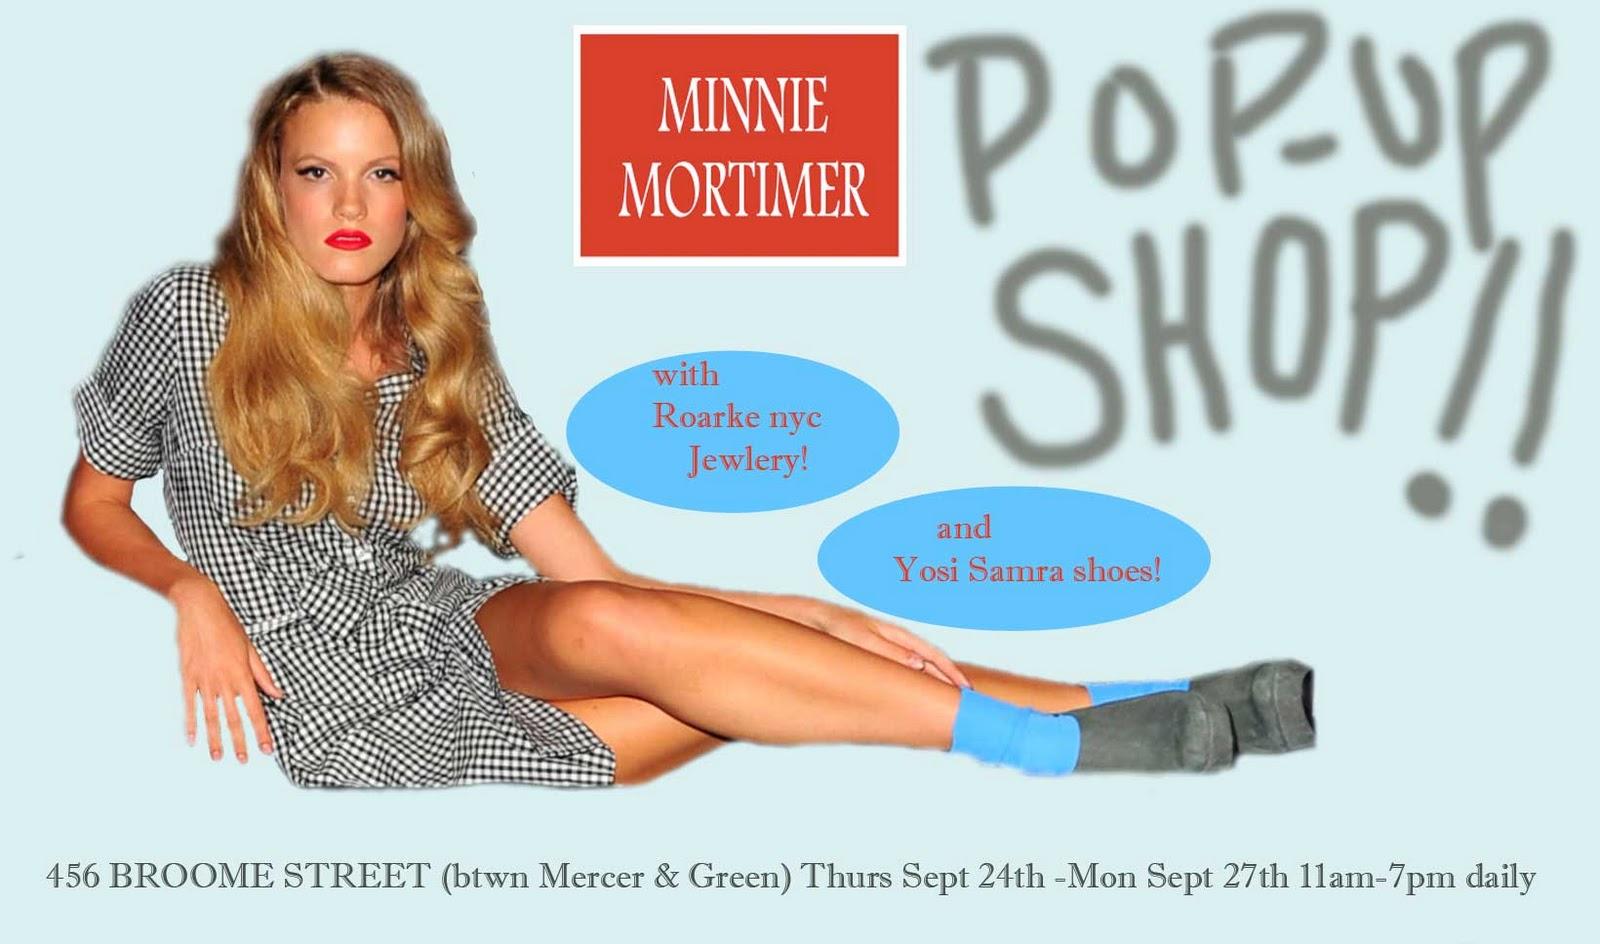 http://4.bp.blogspot.com/_my97a64oVsI/TKBwQ102sOI/AAAAAAAAAxg/mvyO7OfVmLo/s1600/Pop-Up-Shop-Invite.jpg